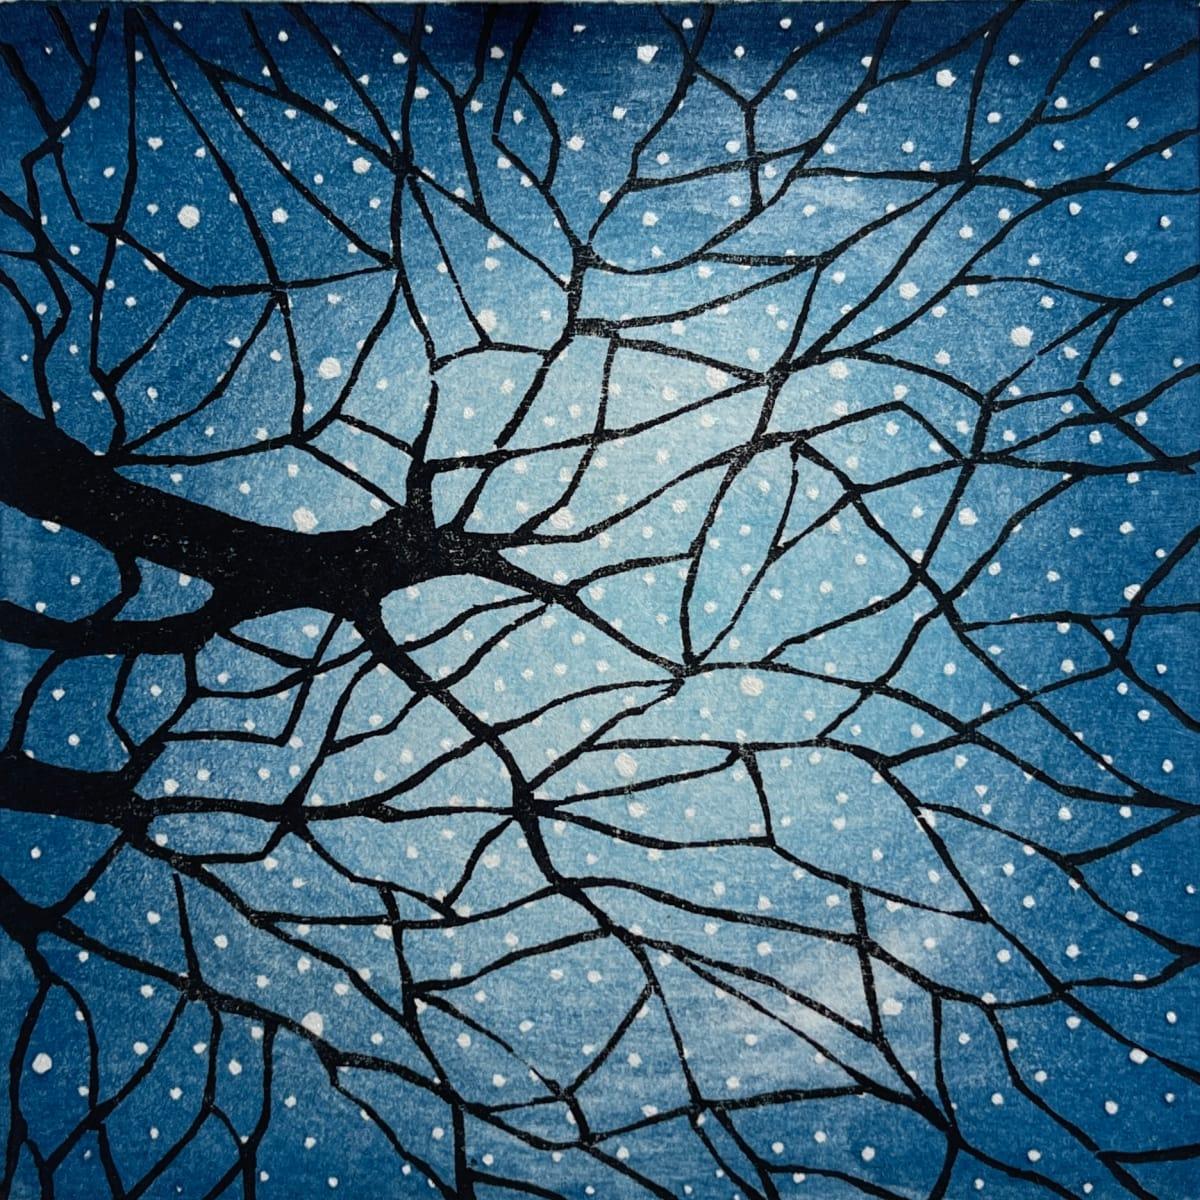 Constellation #2 by Mara Cozzolino